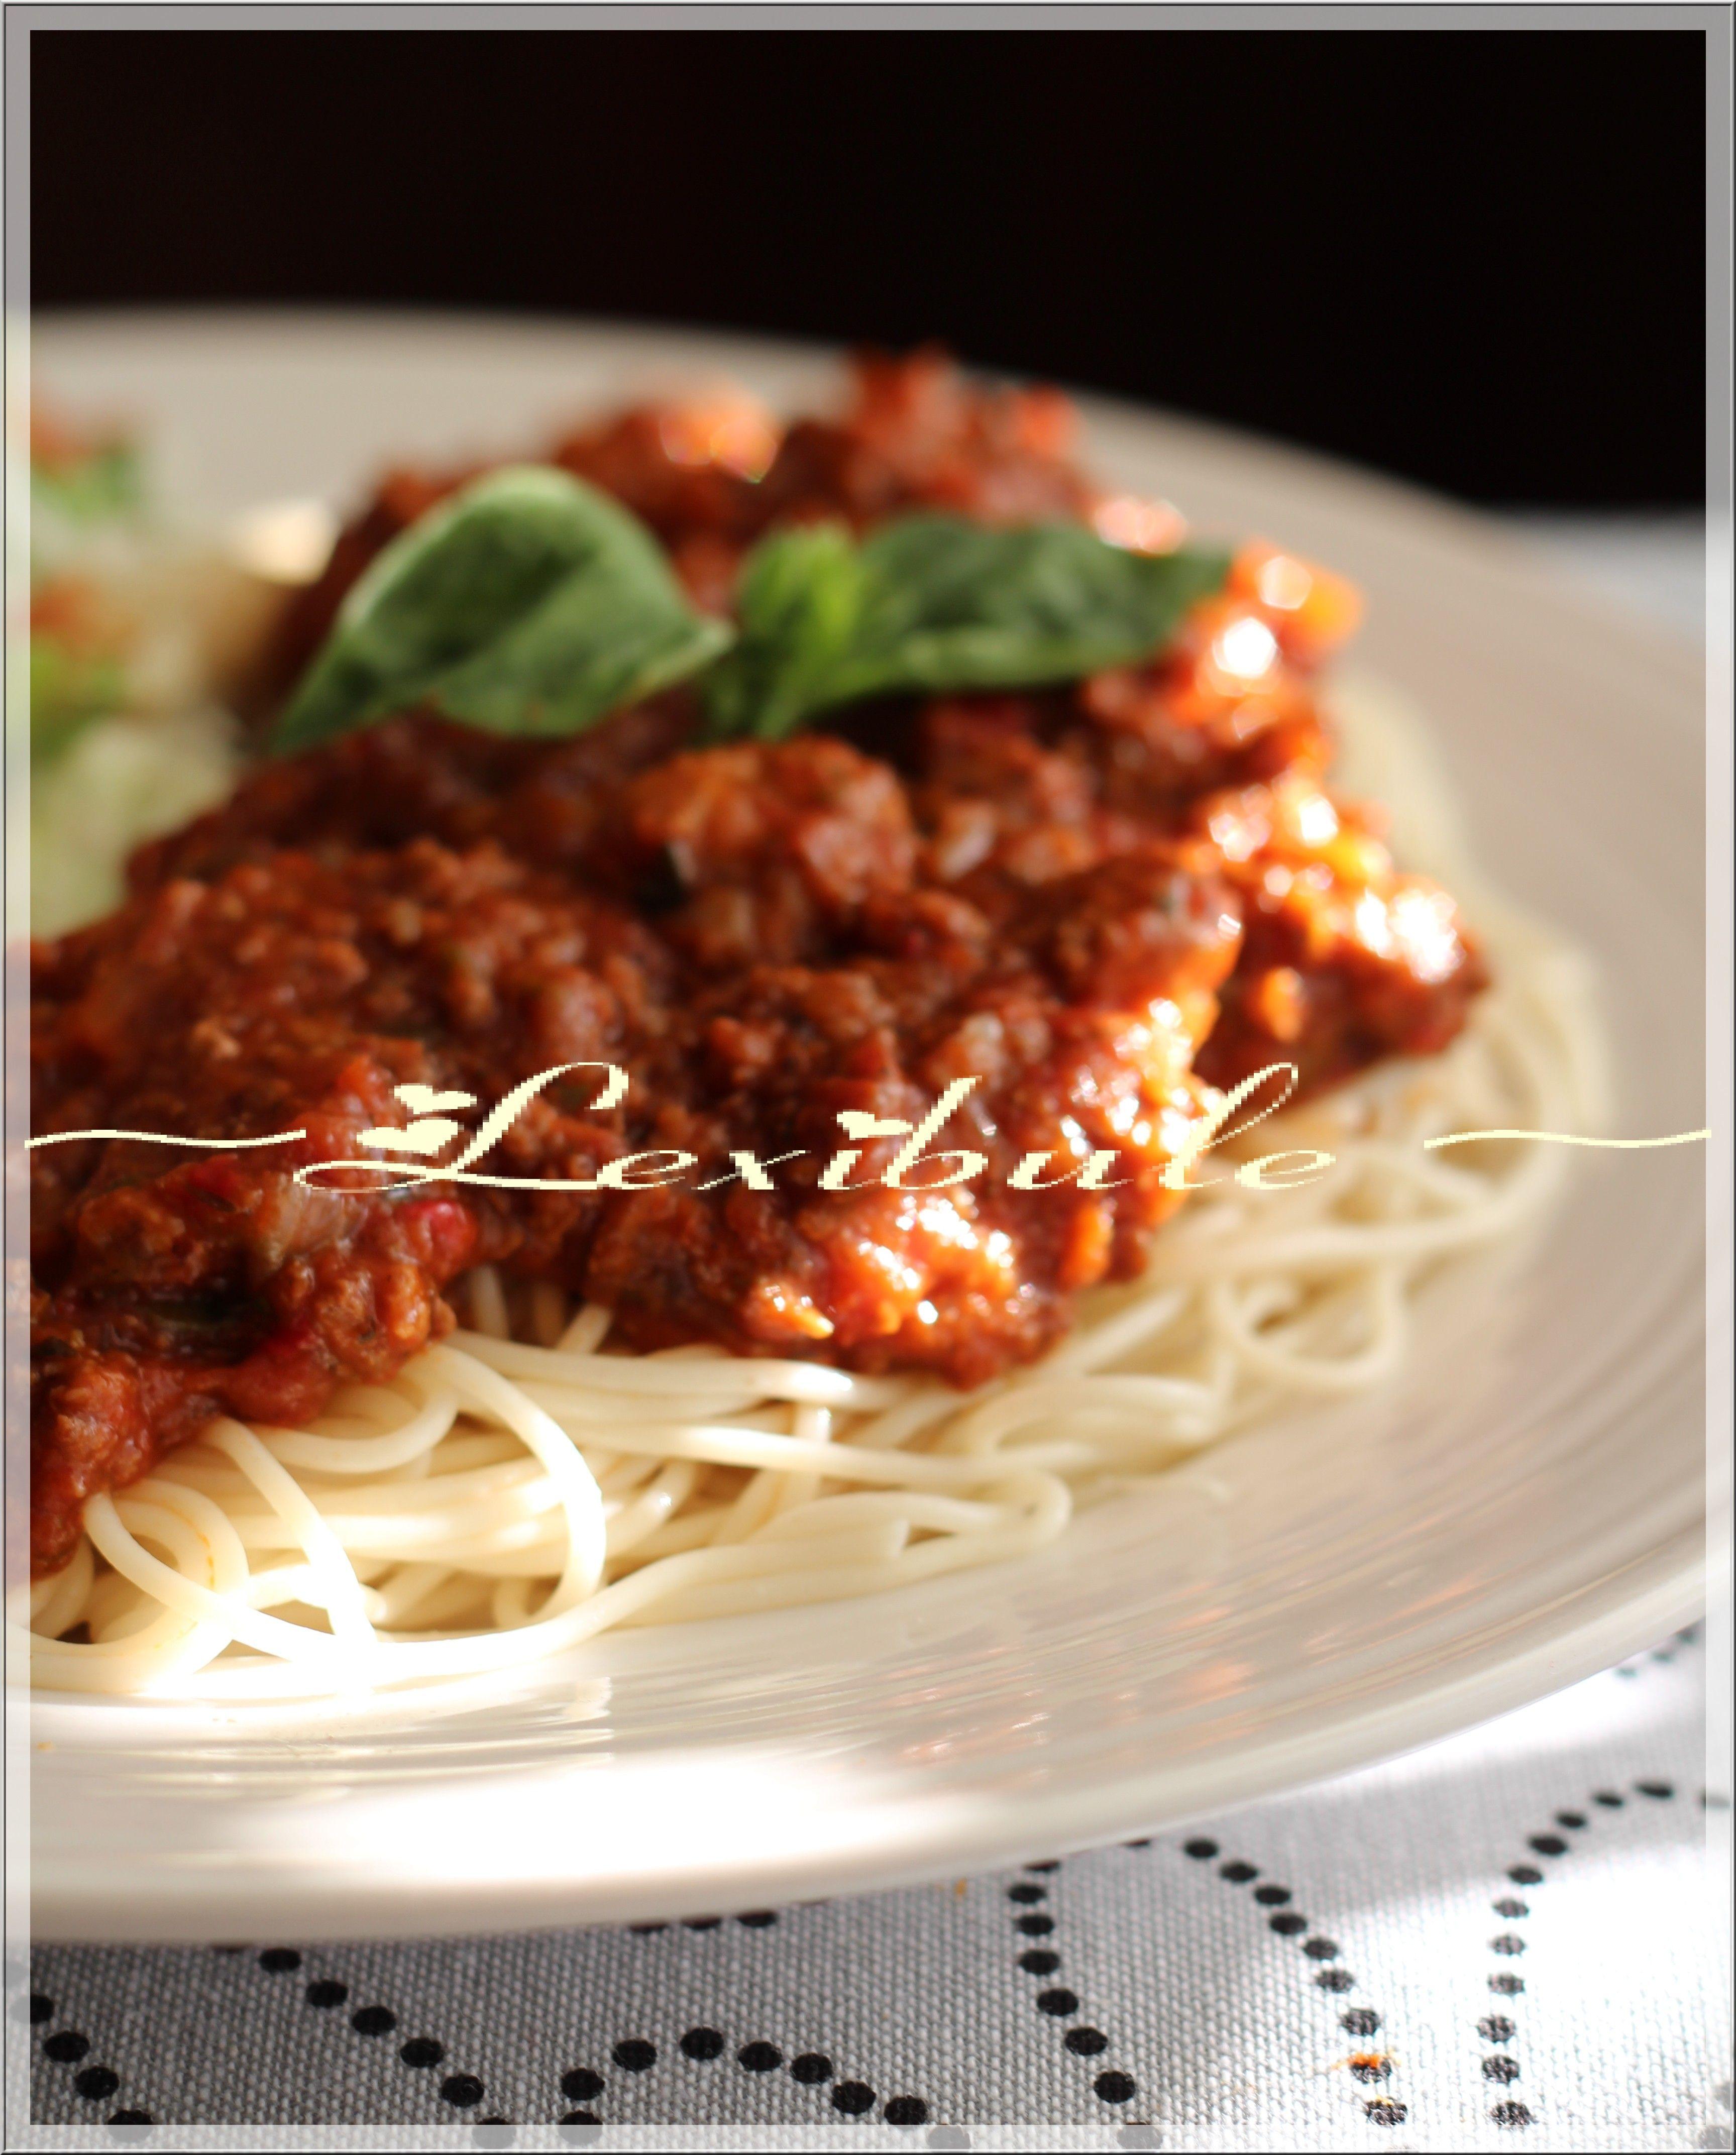 Sauce à spaghetti au four de Jean-François Plante